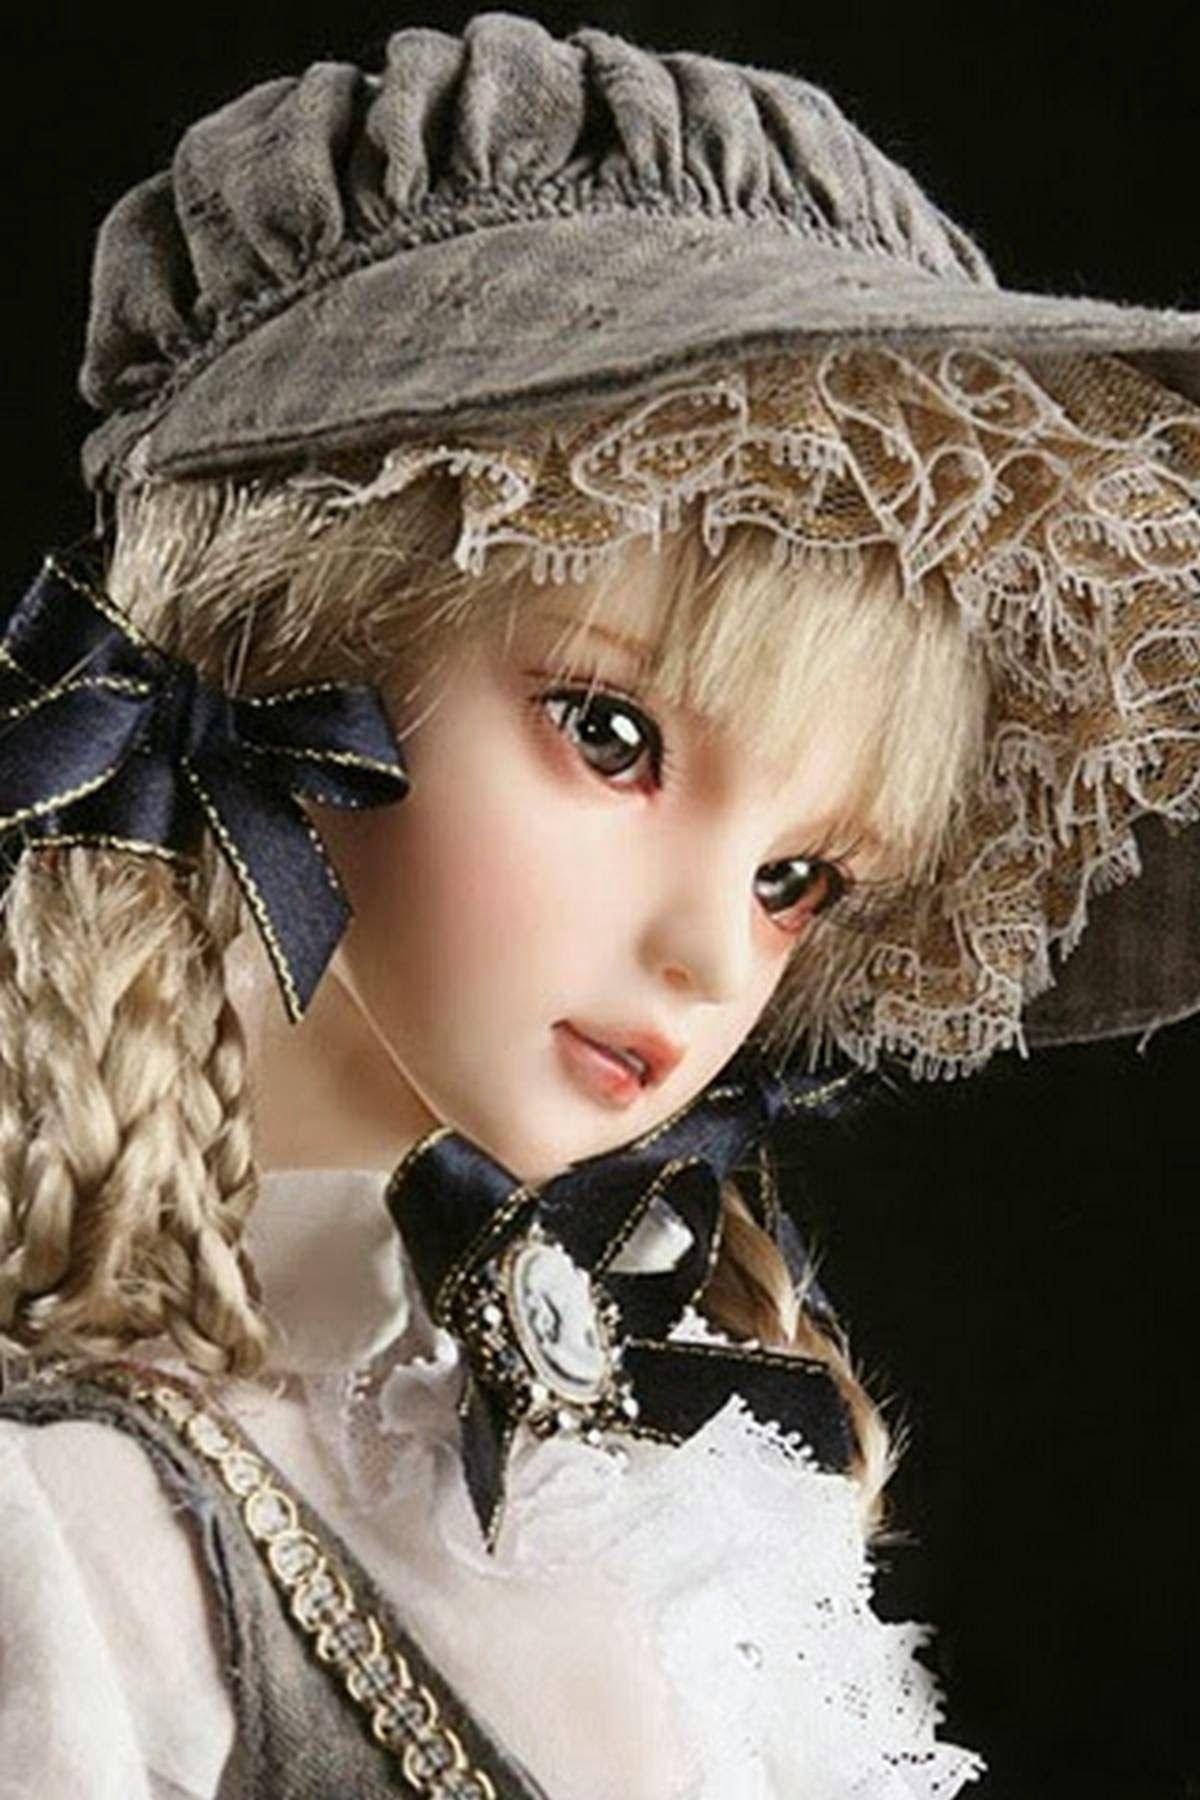 Barbie wallpaper iphone Tema, Pintar, Fundos